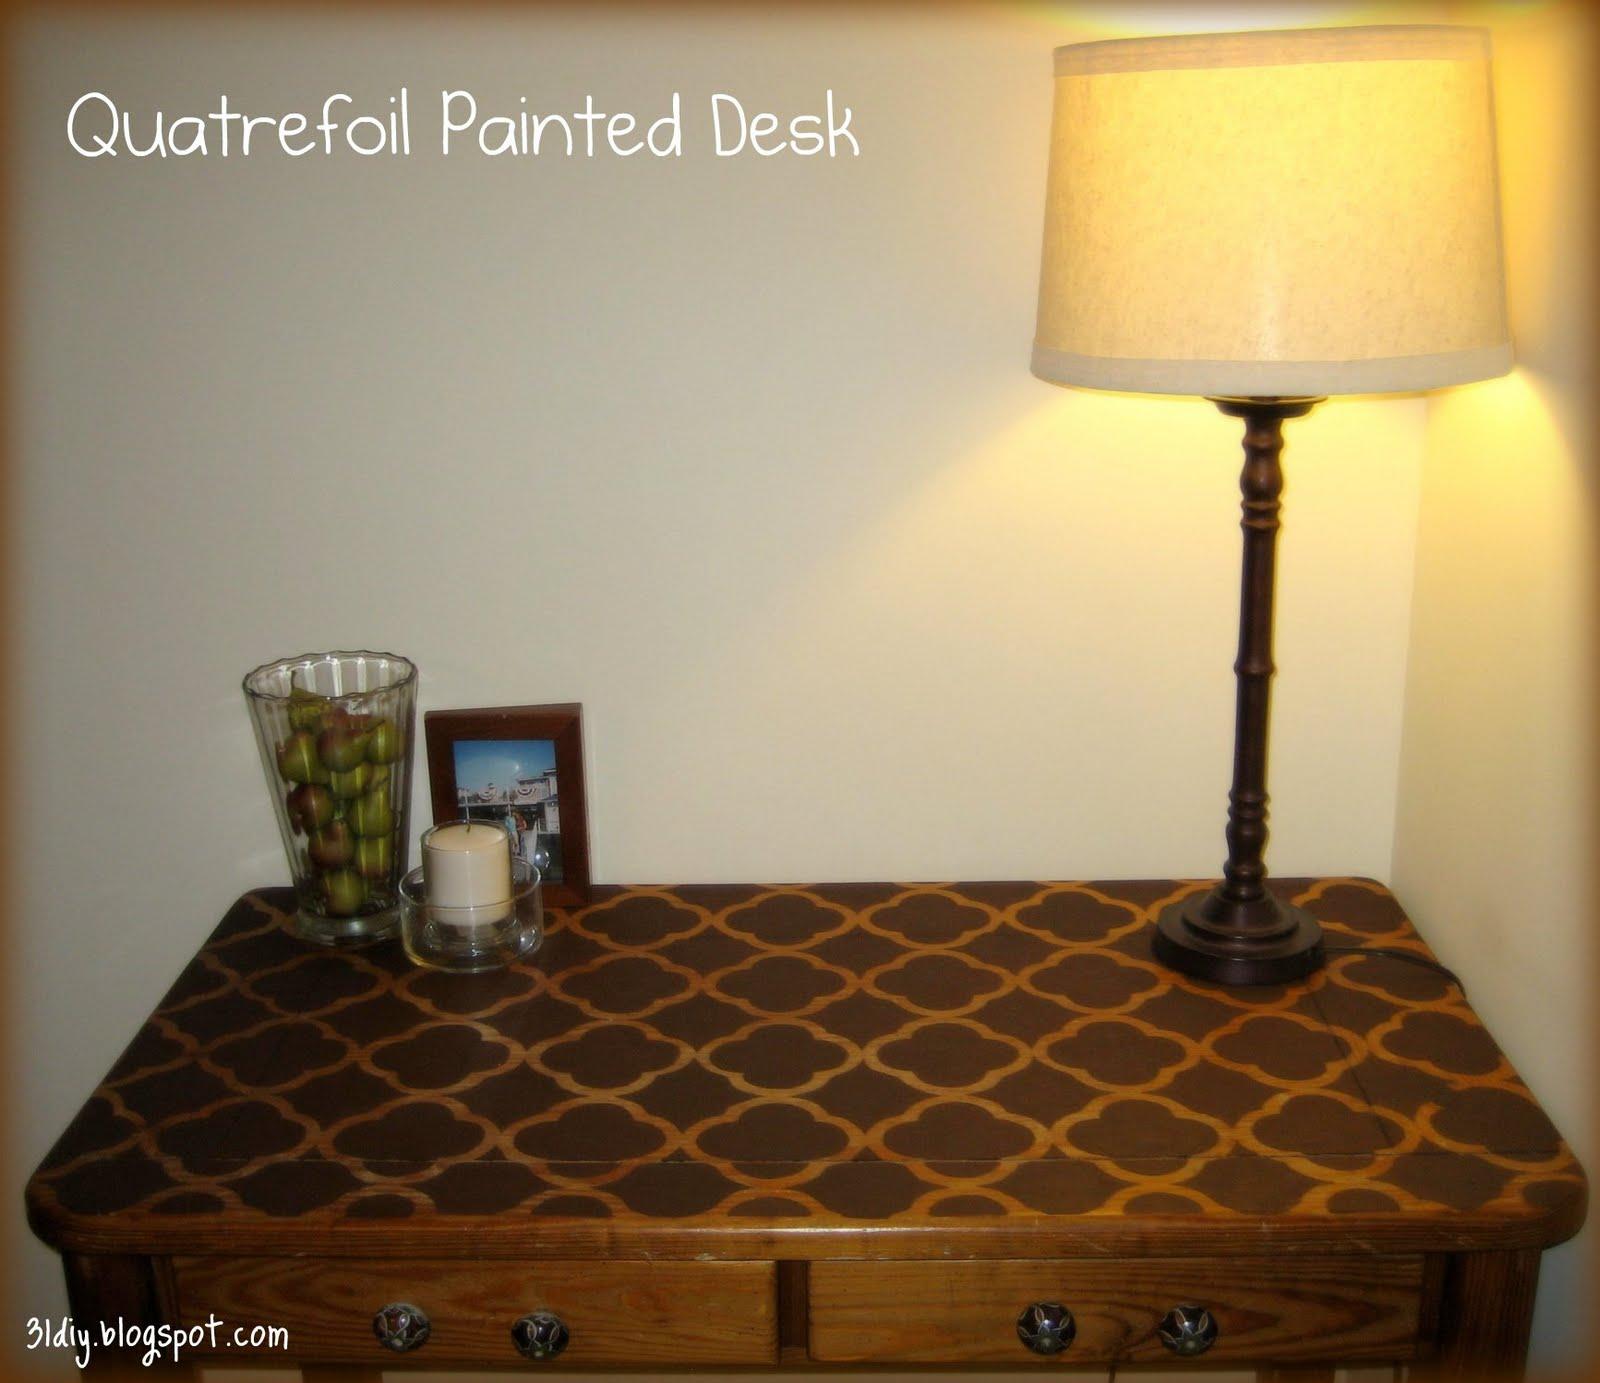 31 diy: Quatrefoil Painted Desk {tutorial}